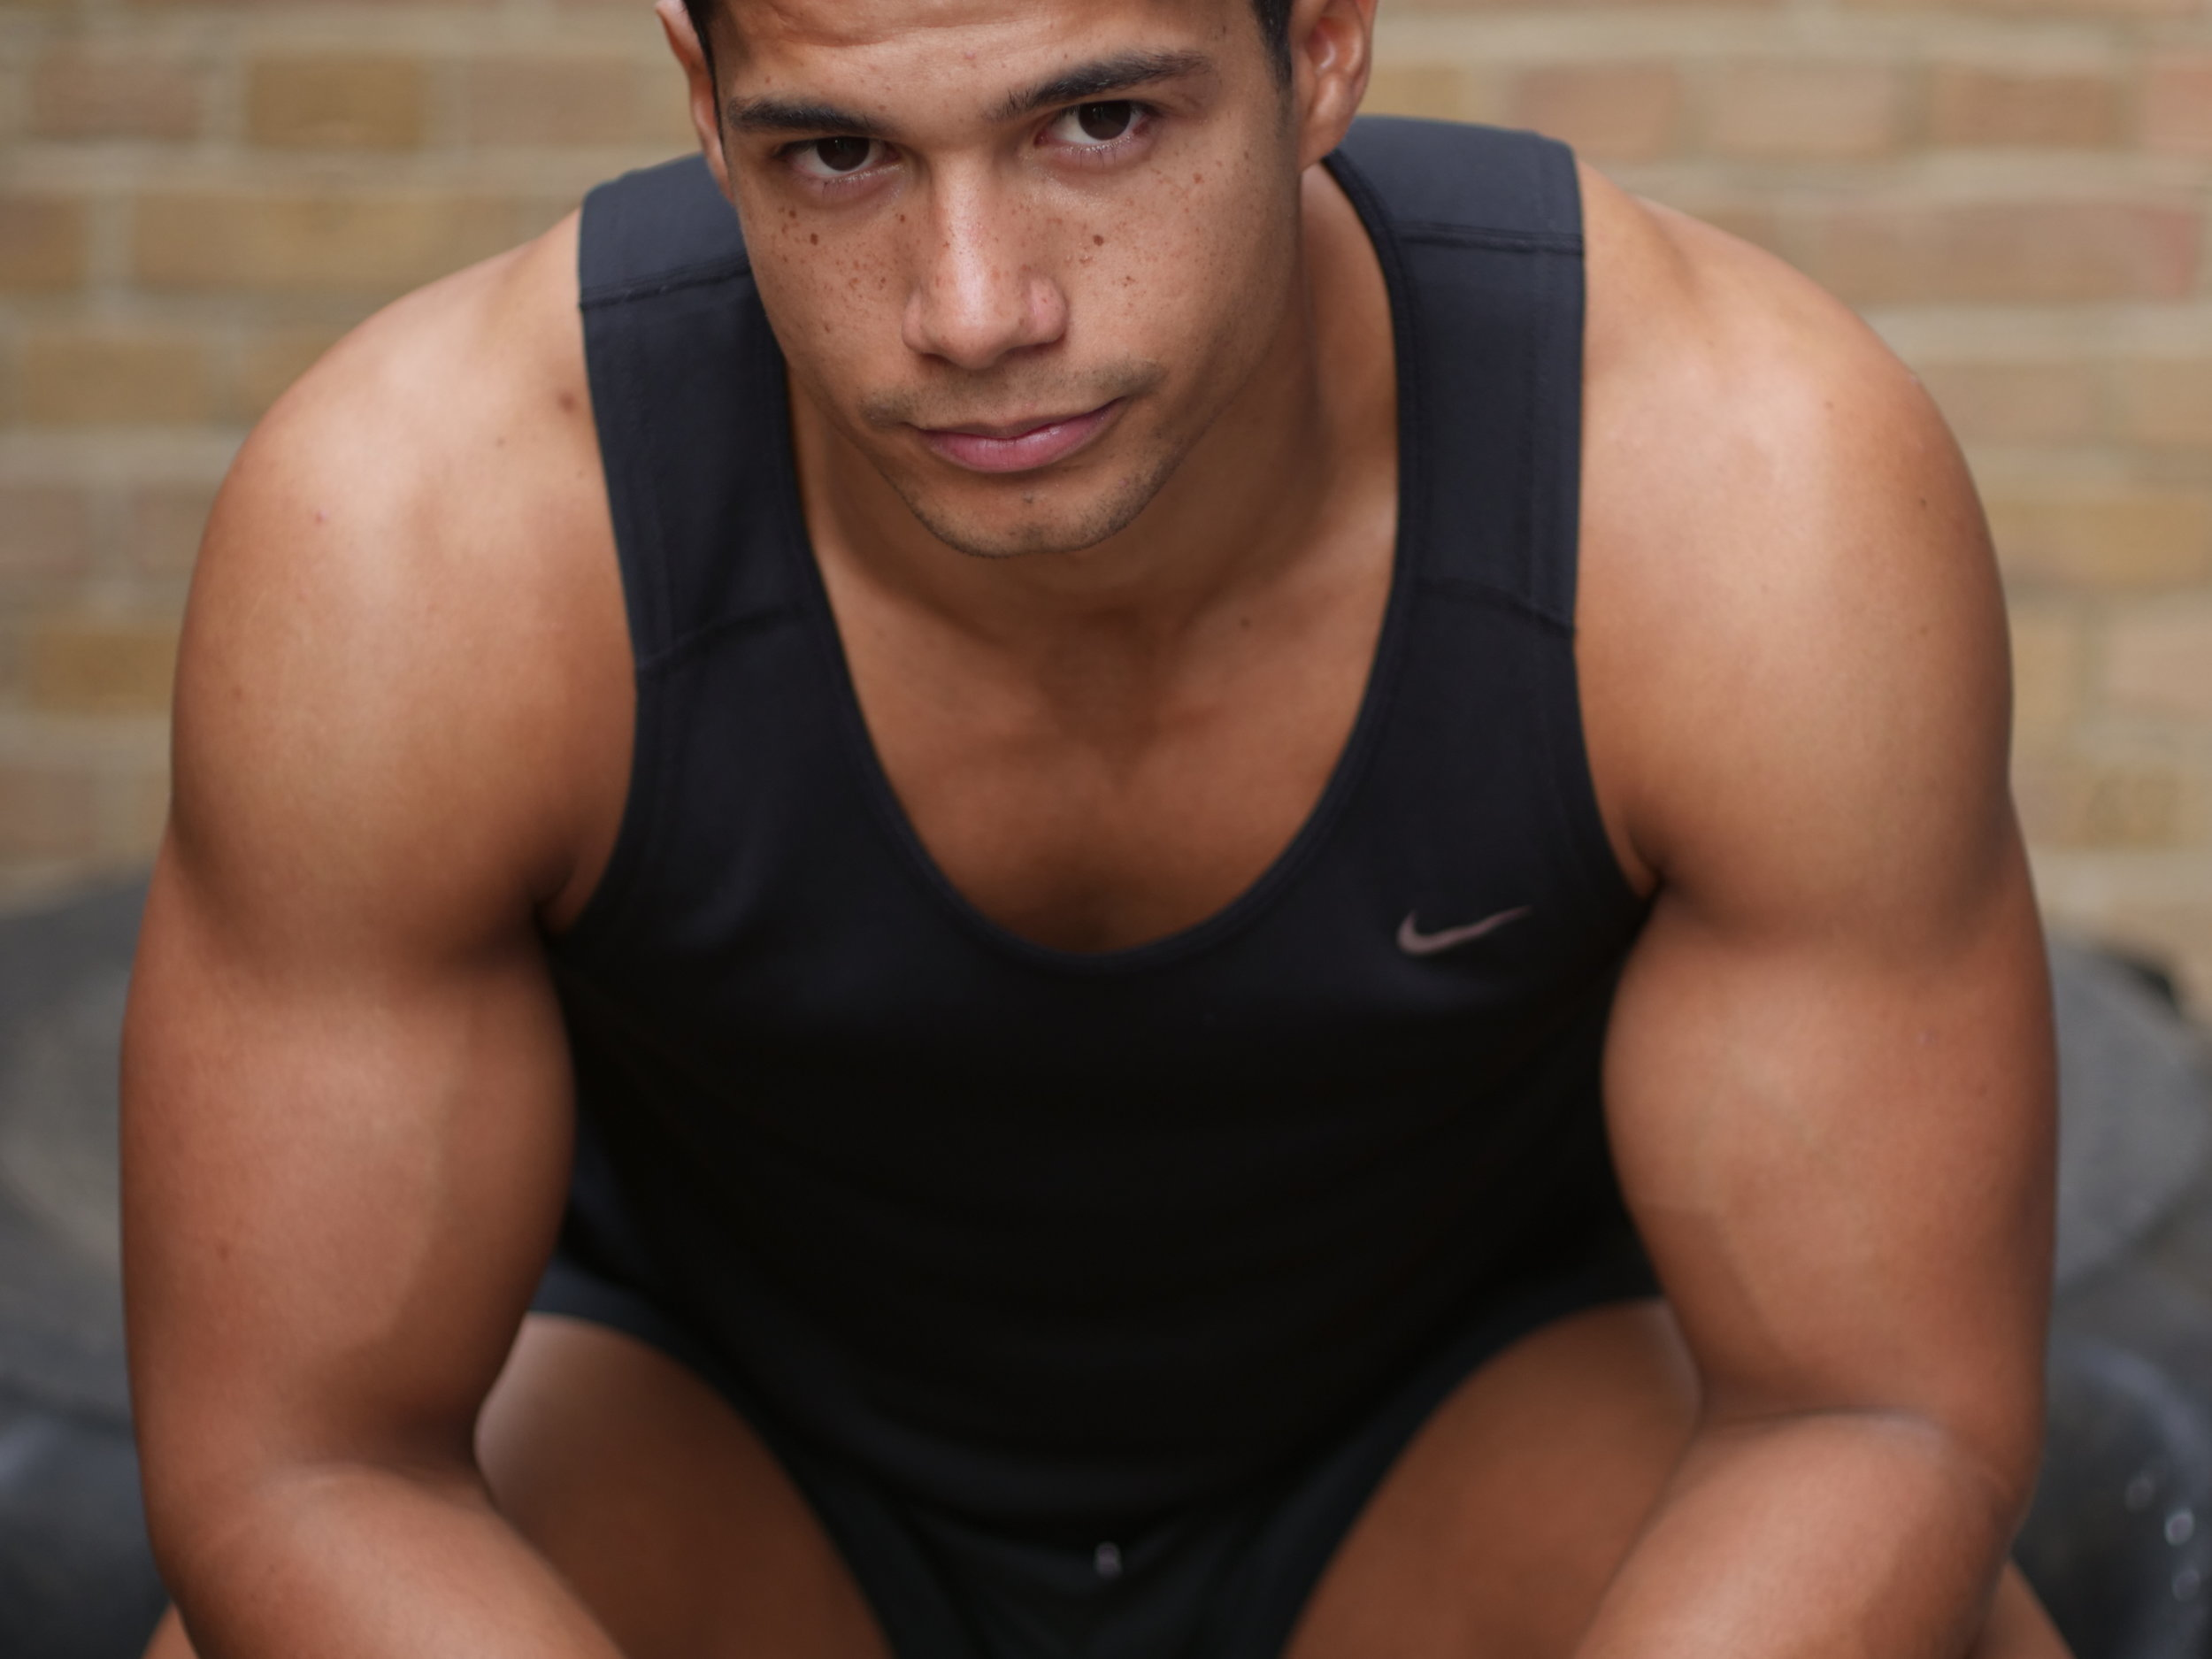 London Bridge Personal trainer Samuel Figueroa